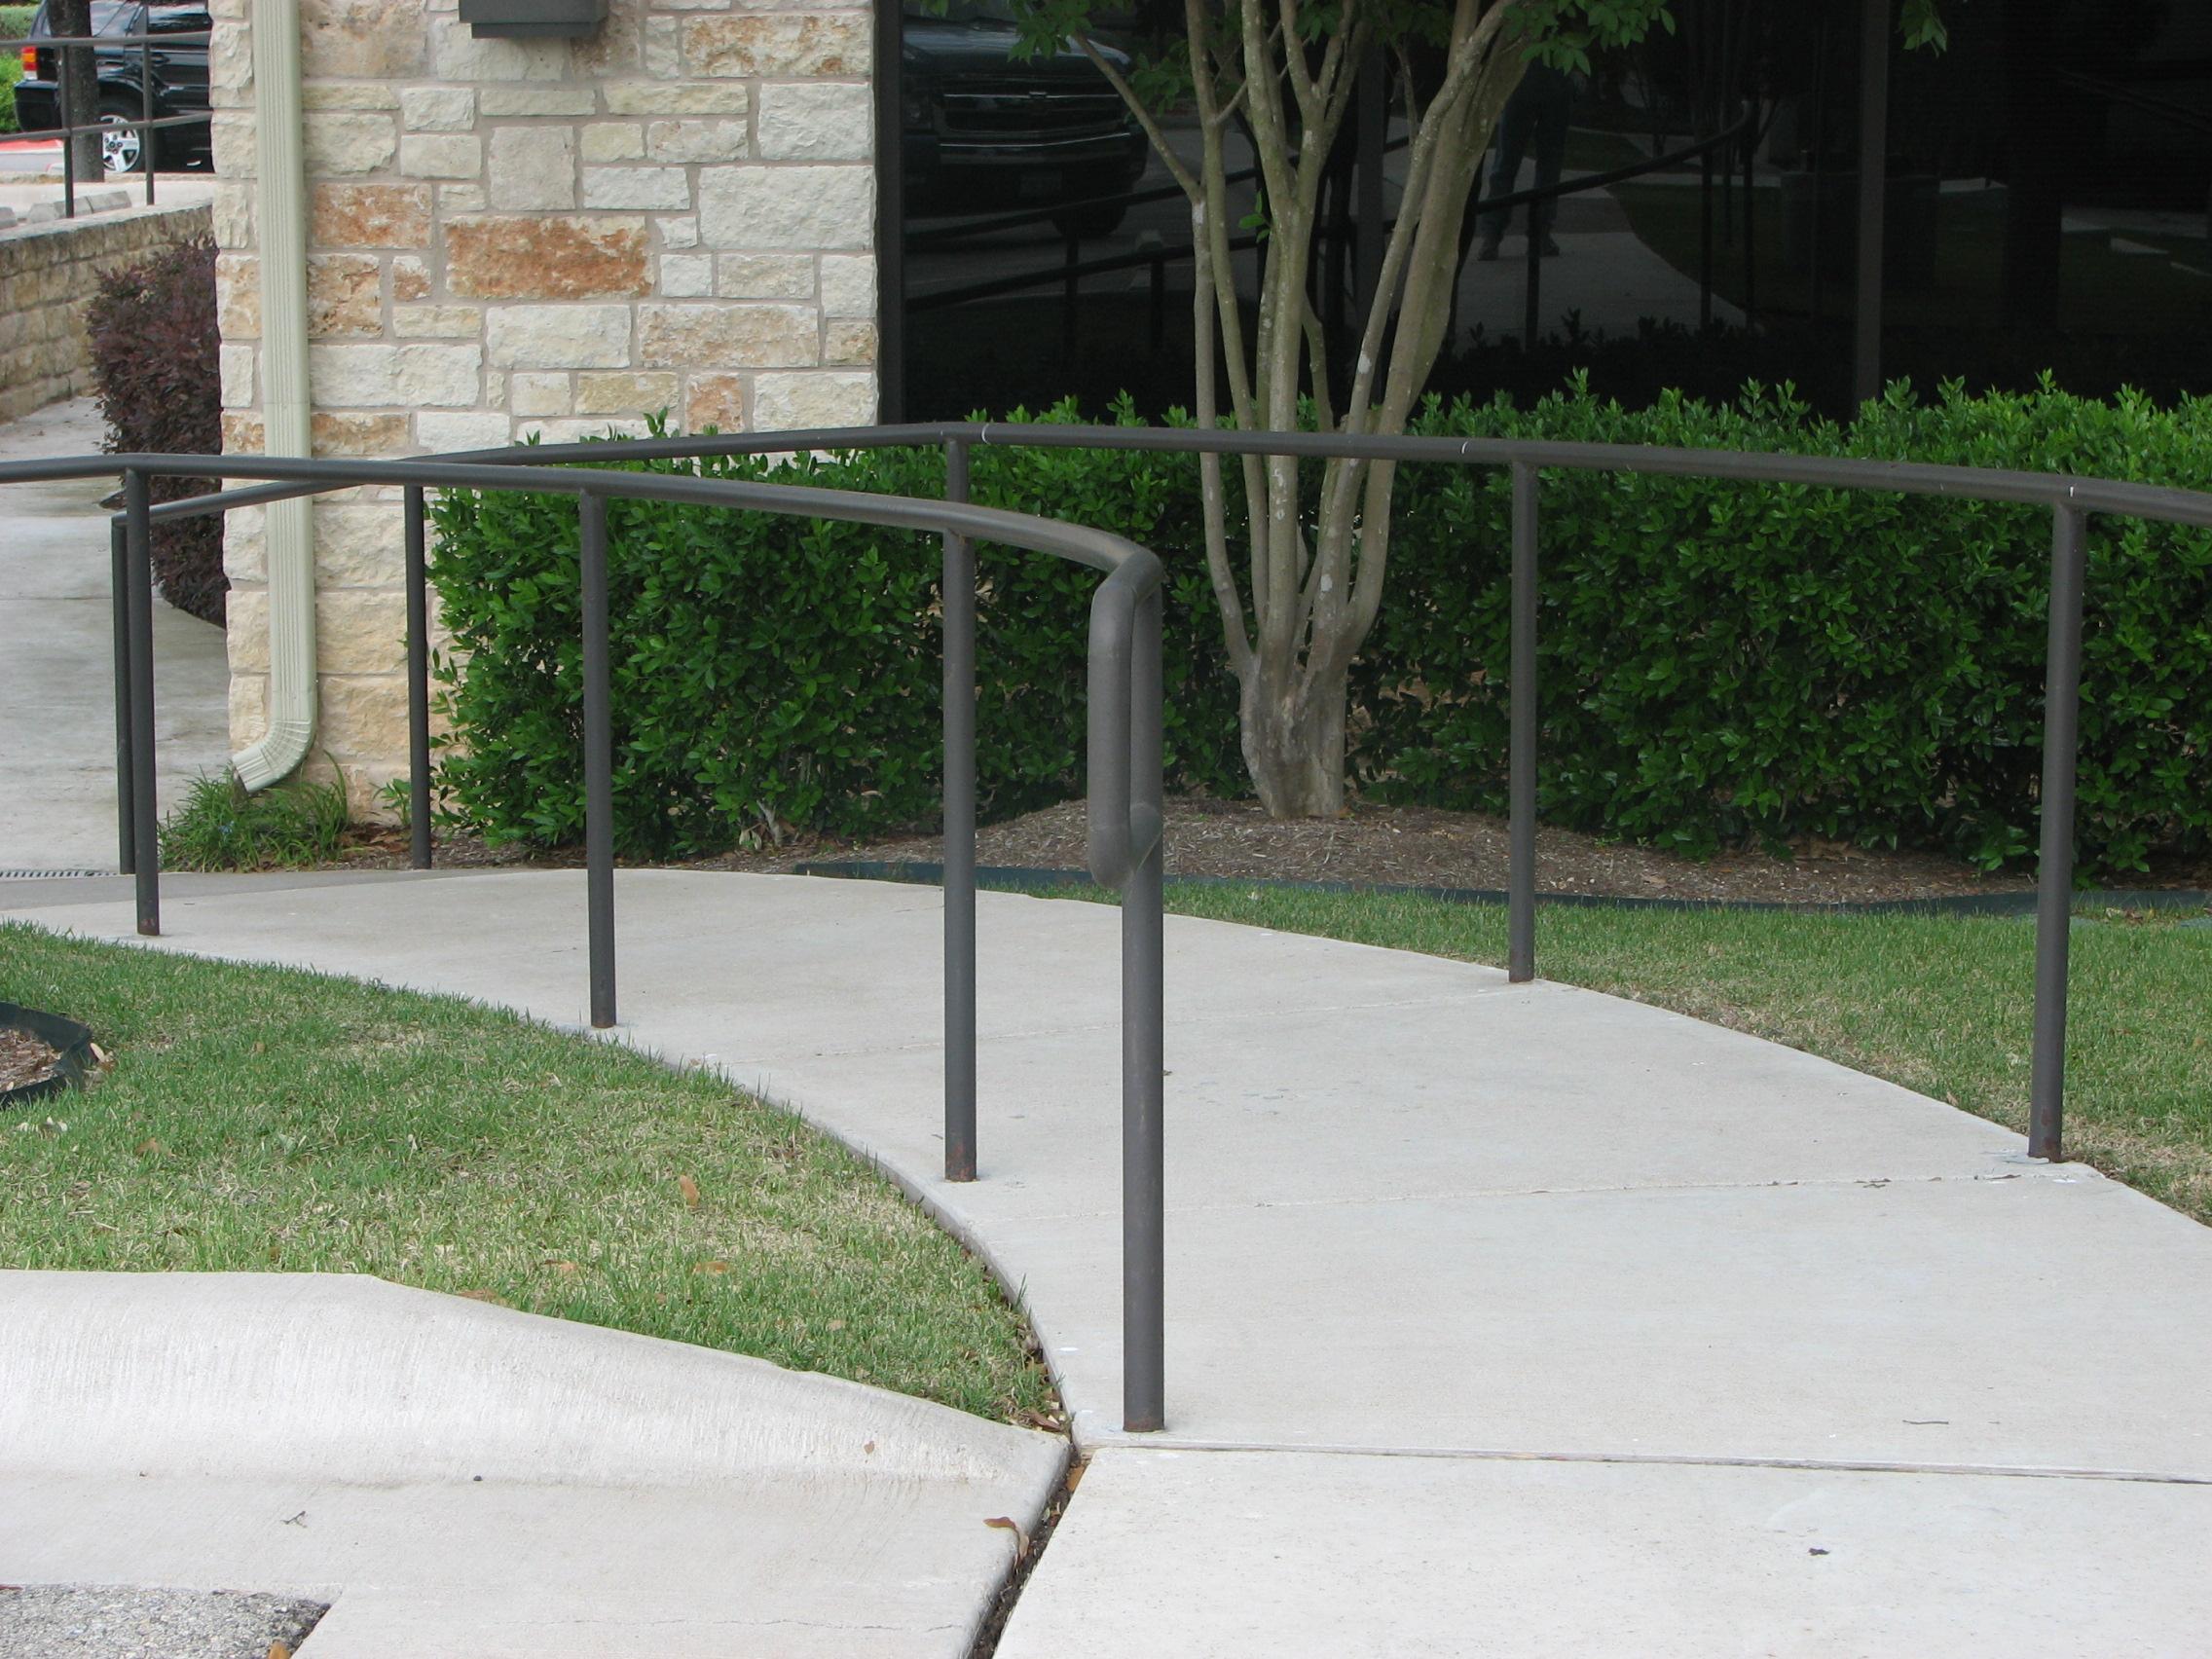 Handicap ramps and handrails